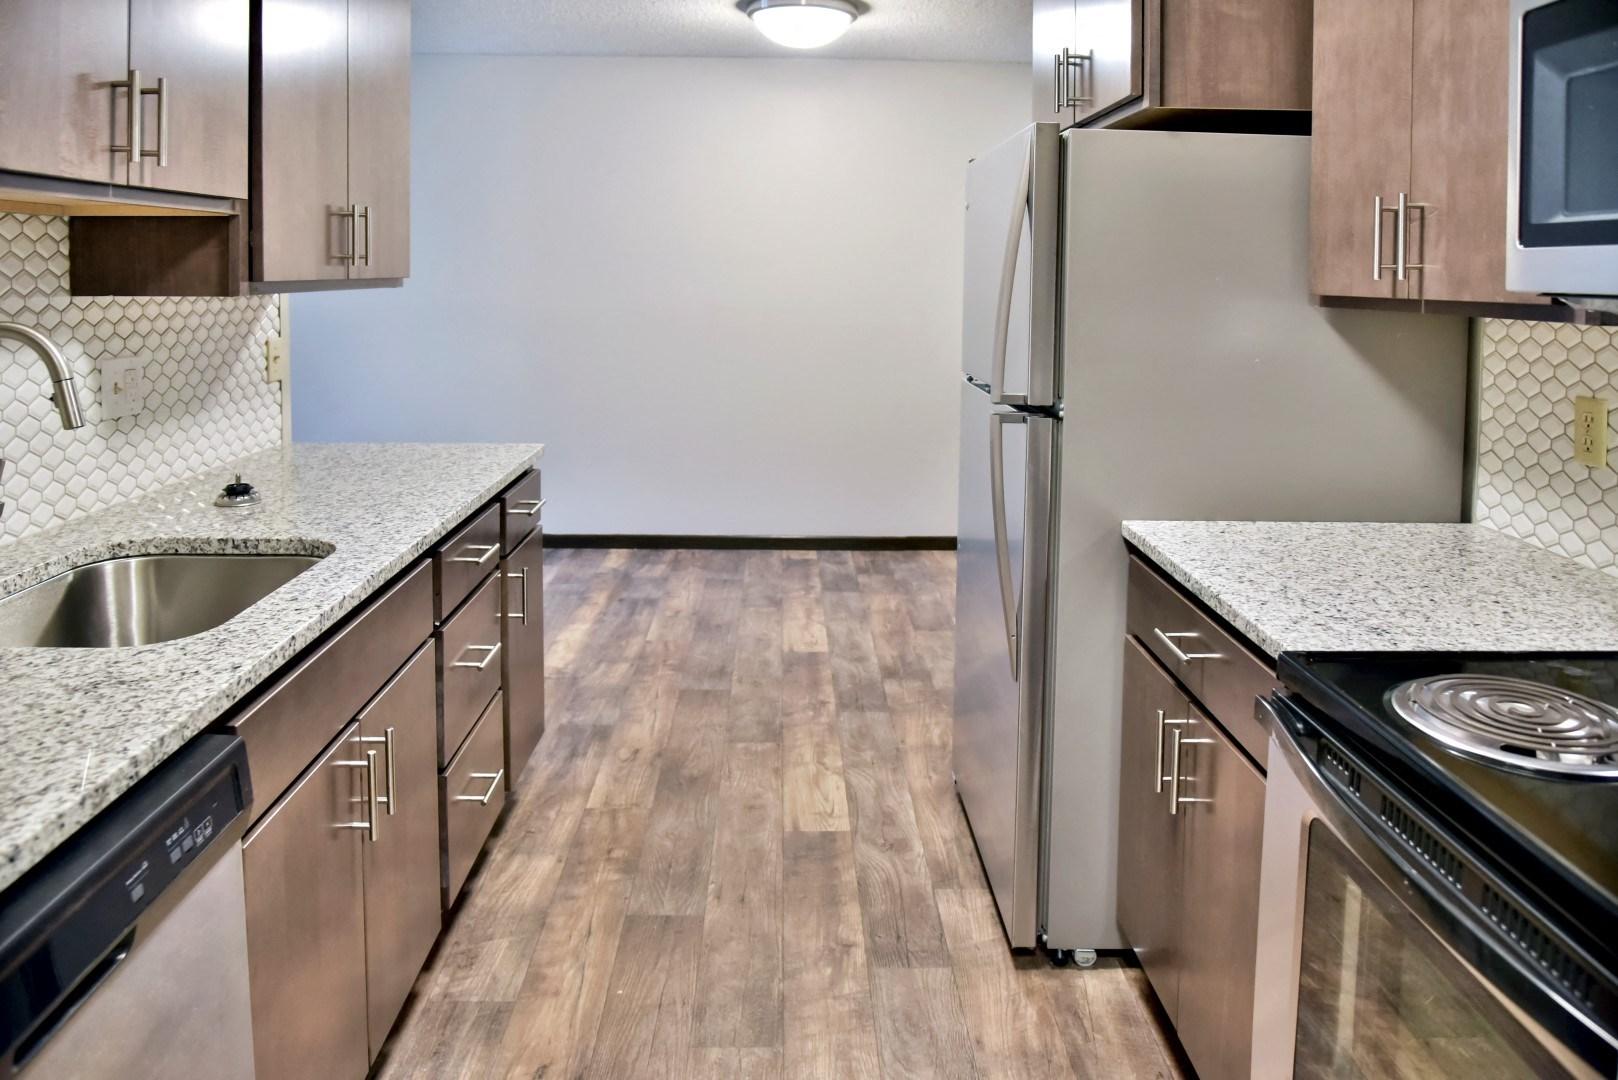 Dishwasher, Refrigerator, Microwave In Kitchen at Eagan Place Apartments, Eagan, 55123